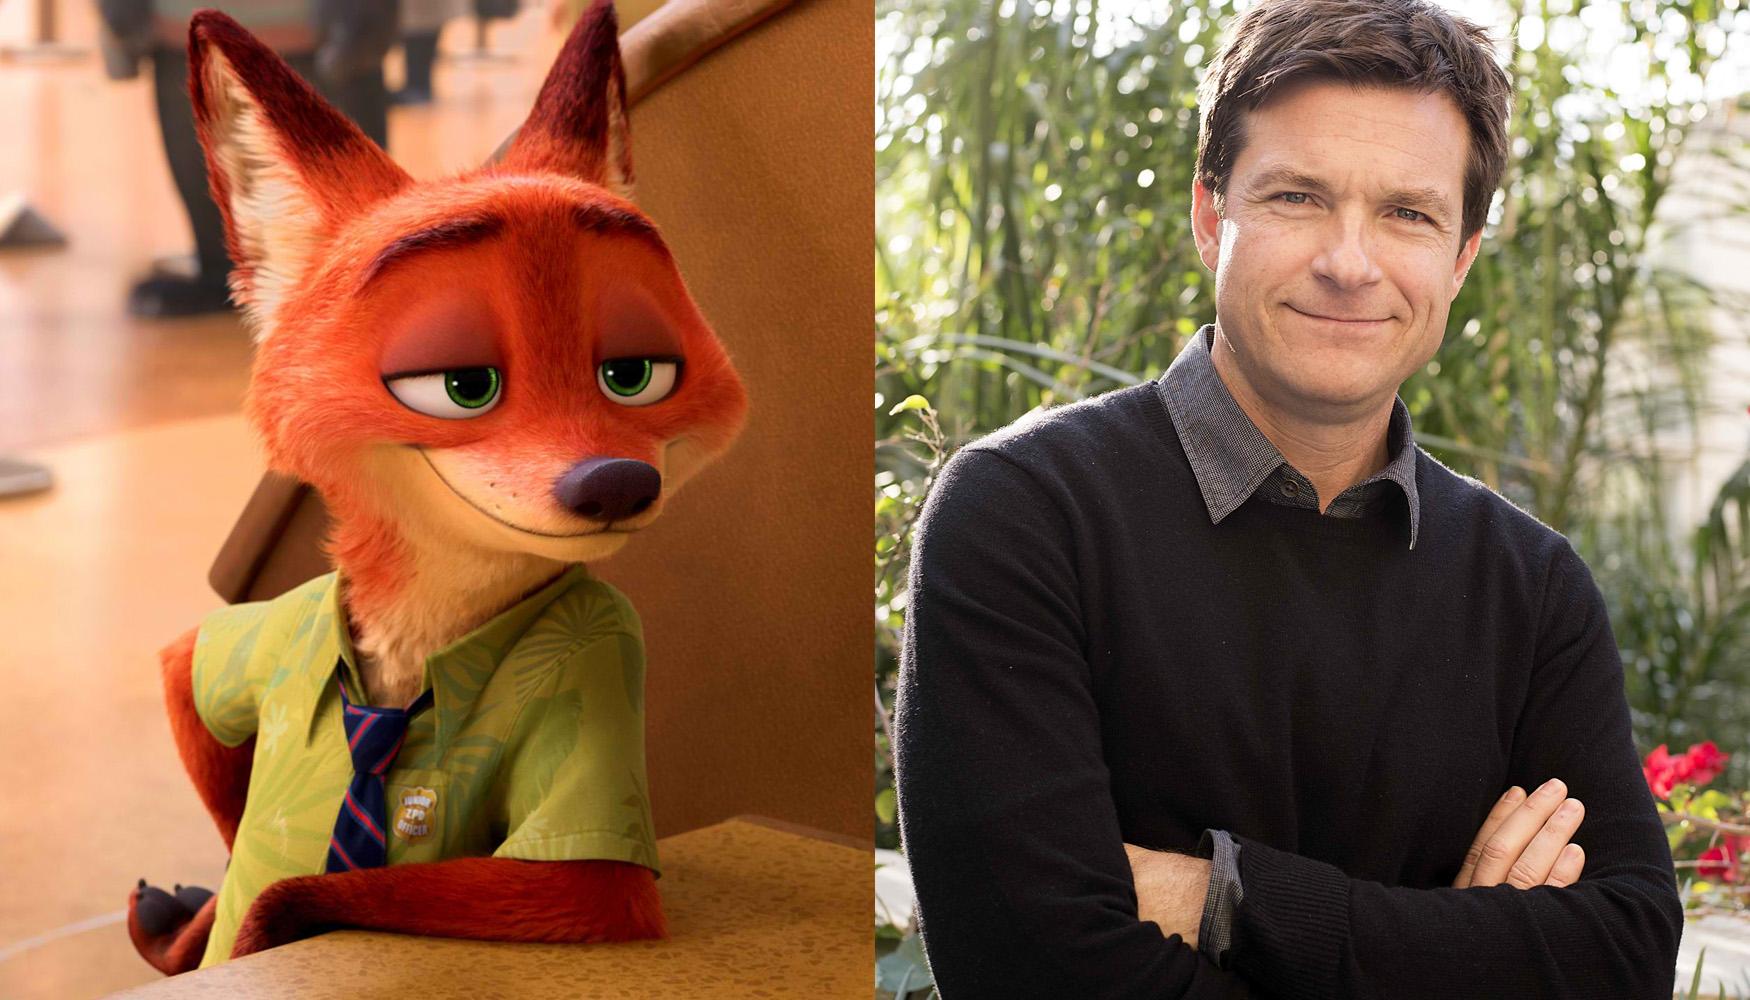 jason bateman lends voice to conartist fox in �zootopia